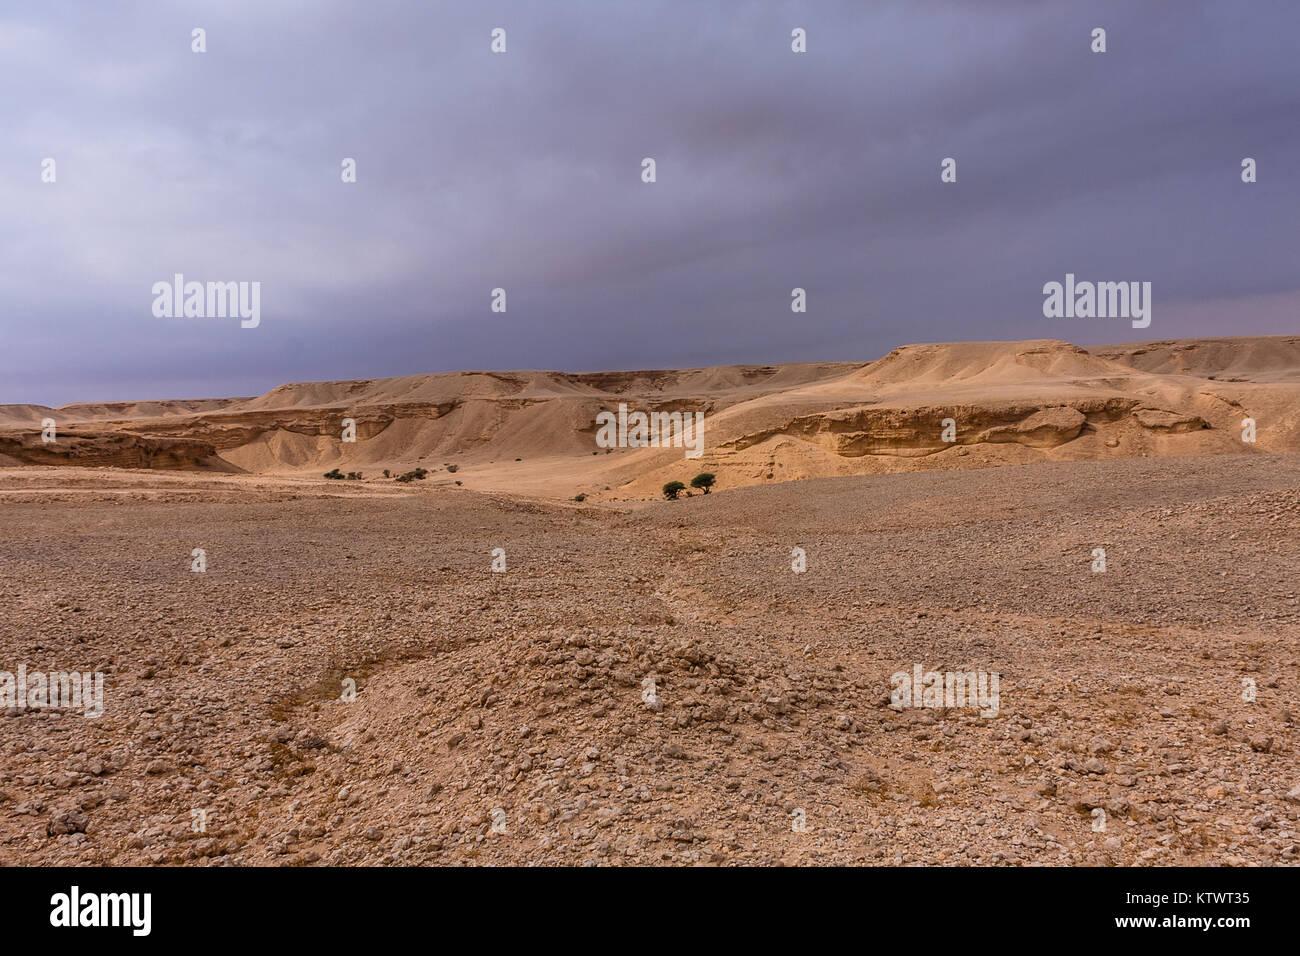 Un paisaje desértico al Este de Riad Imagen De Stock